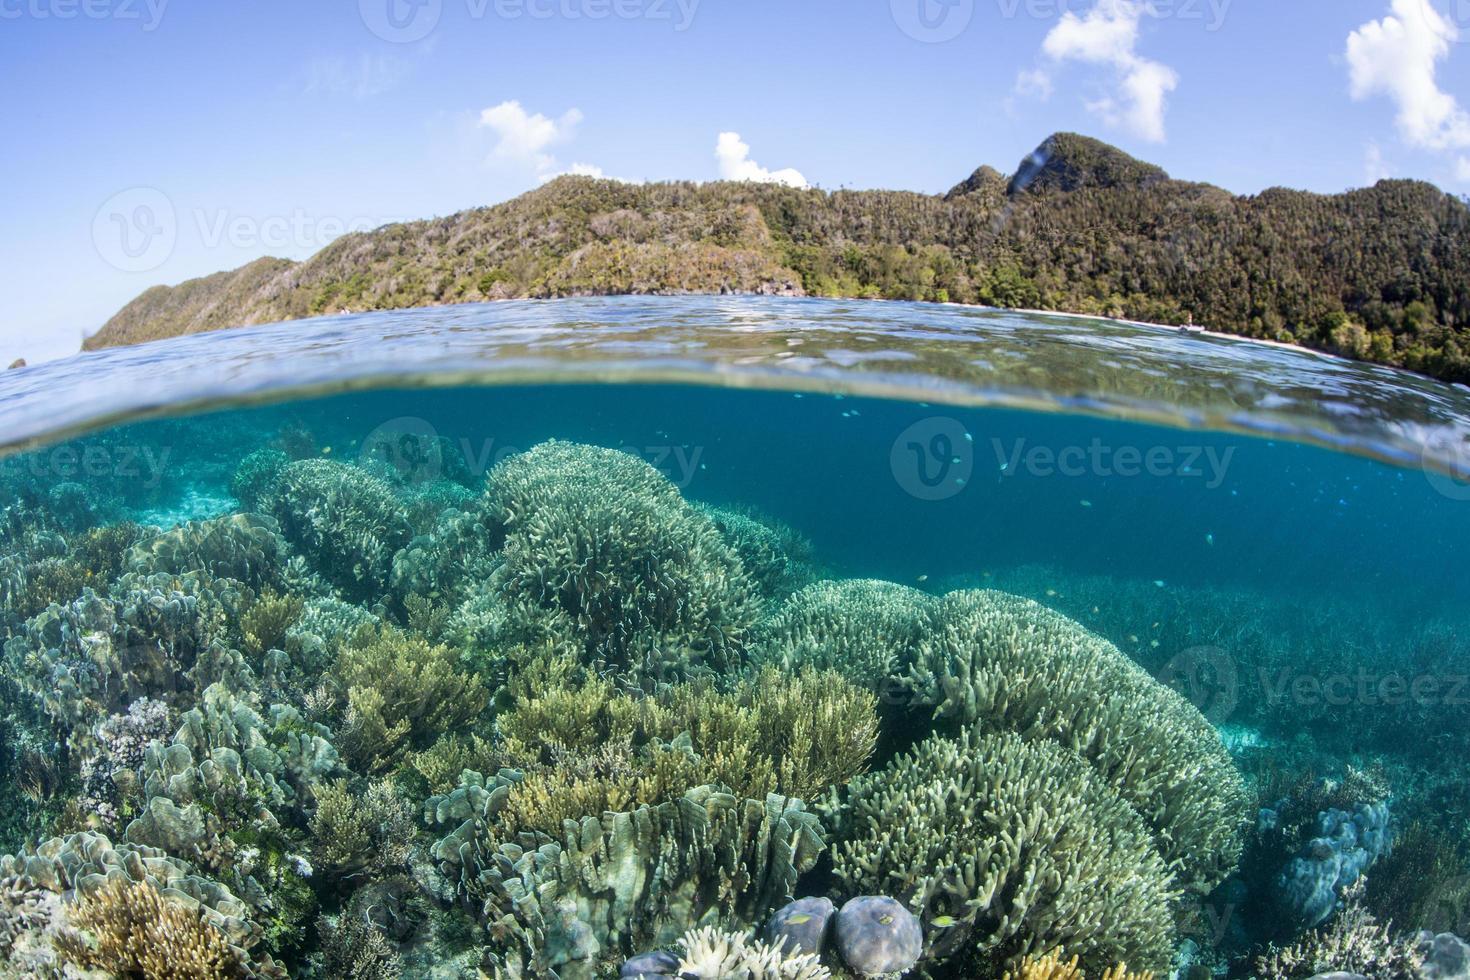 Korallenriff und Wayag-Inseln, Raja Ampat foto